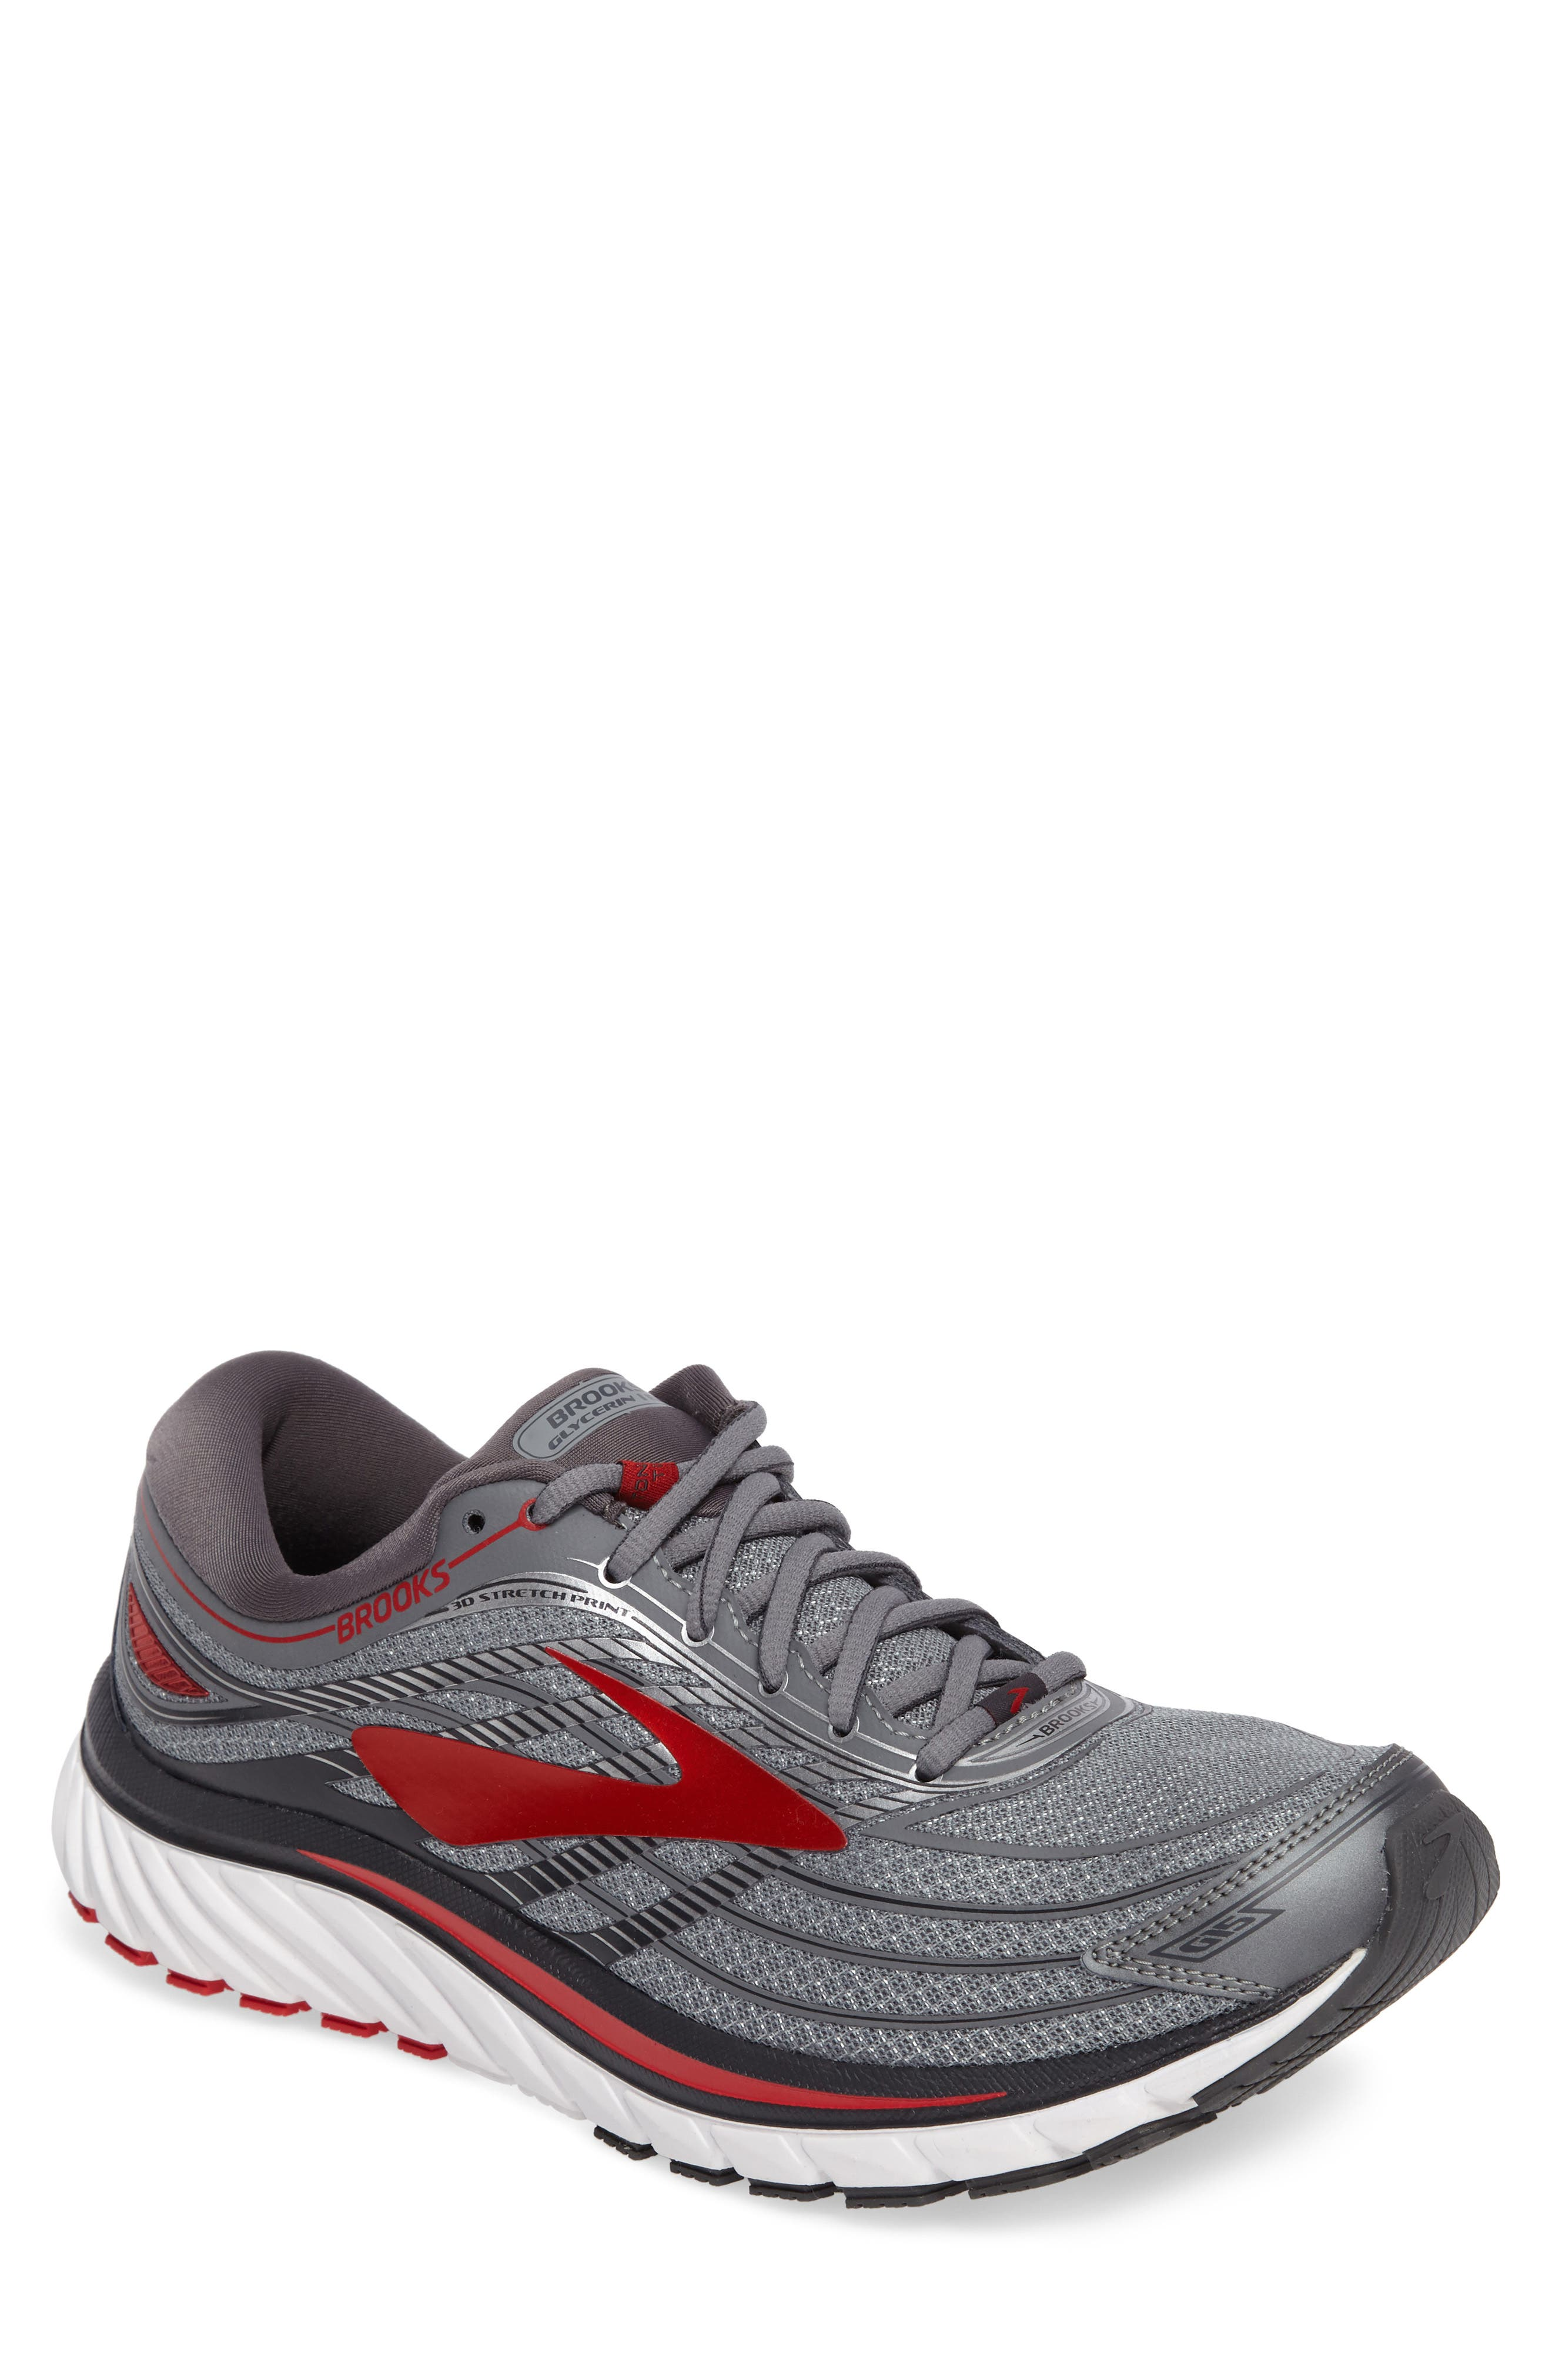 Main Image - Brooks Glycerin 15 Running Shoe (Men)